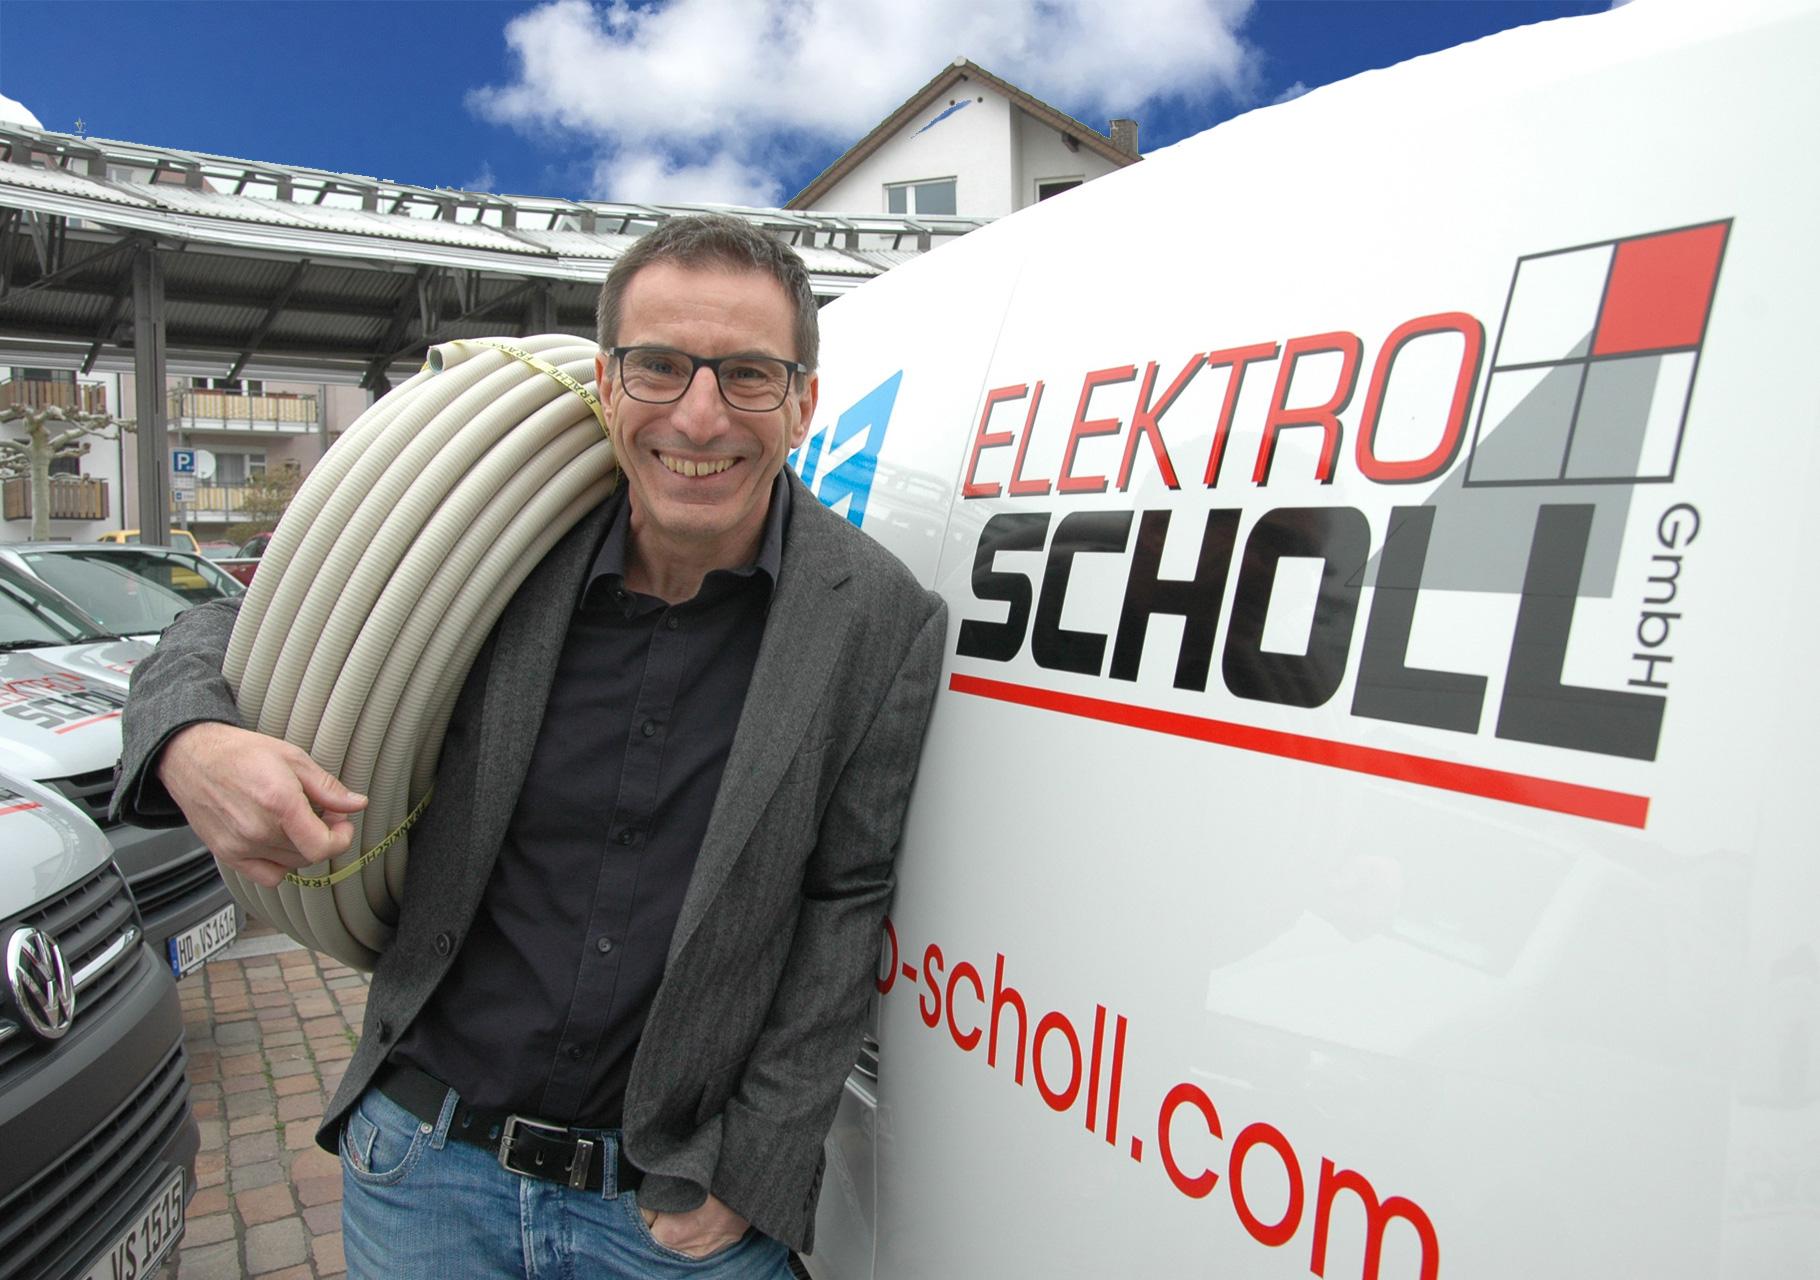 Chefe Viktor Scholl - Geschäftsführer